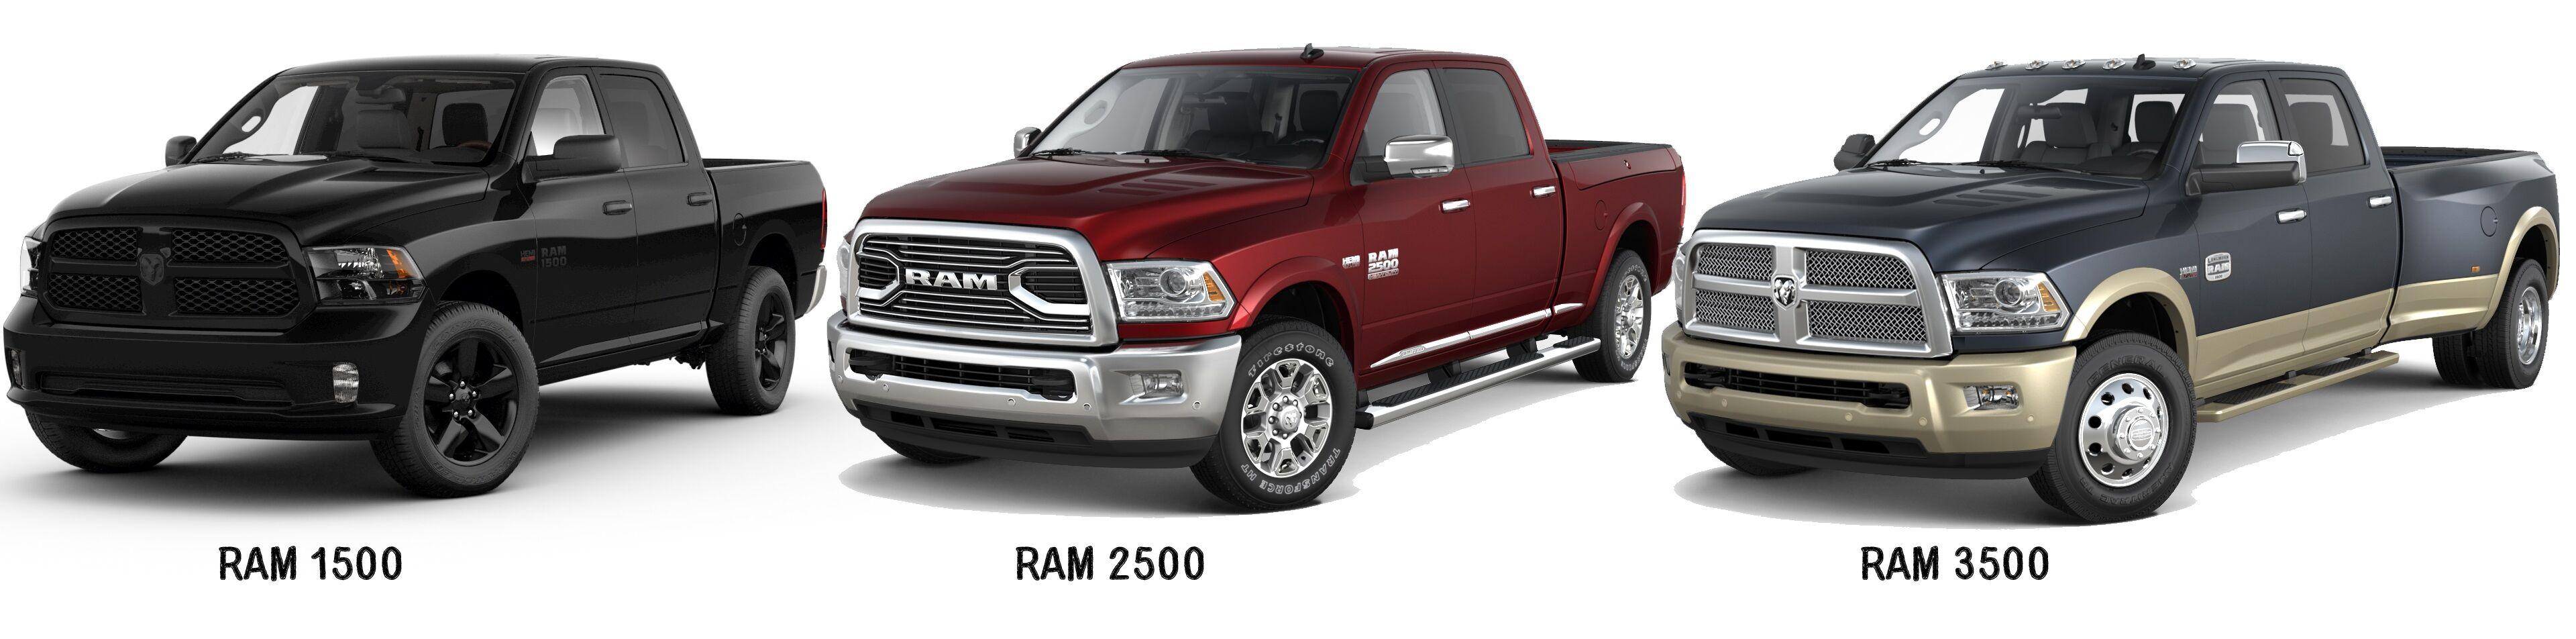 Home 2017 Ram Light Duty and Heavy Duty Trucks